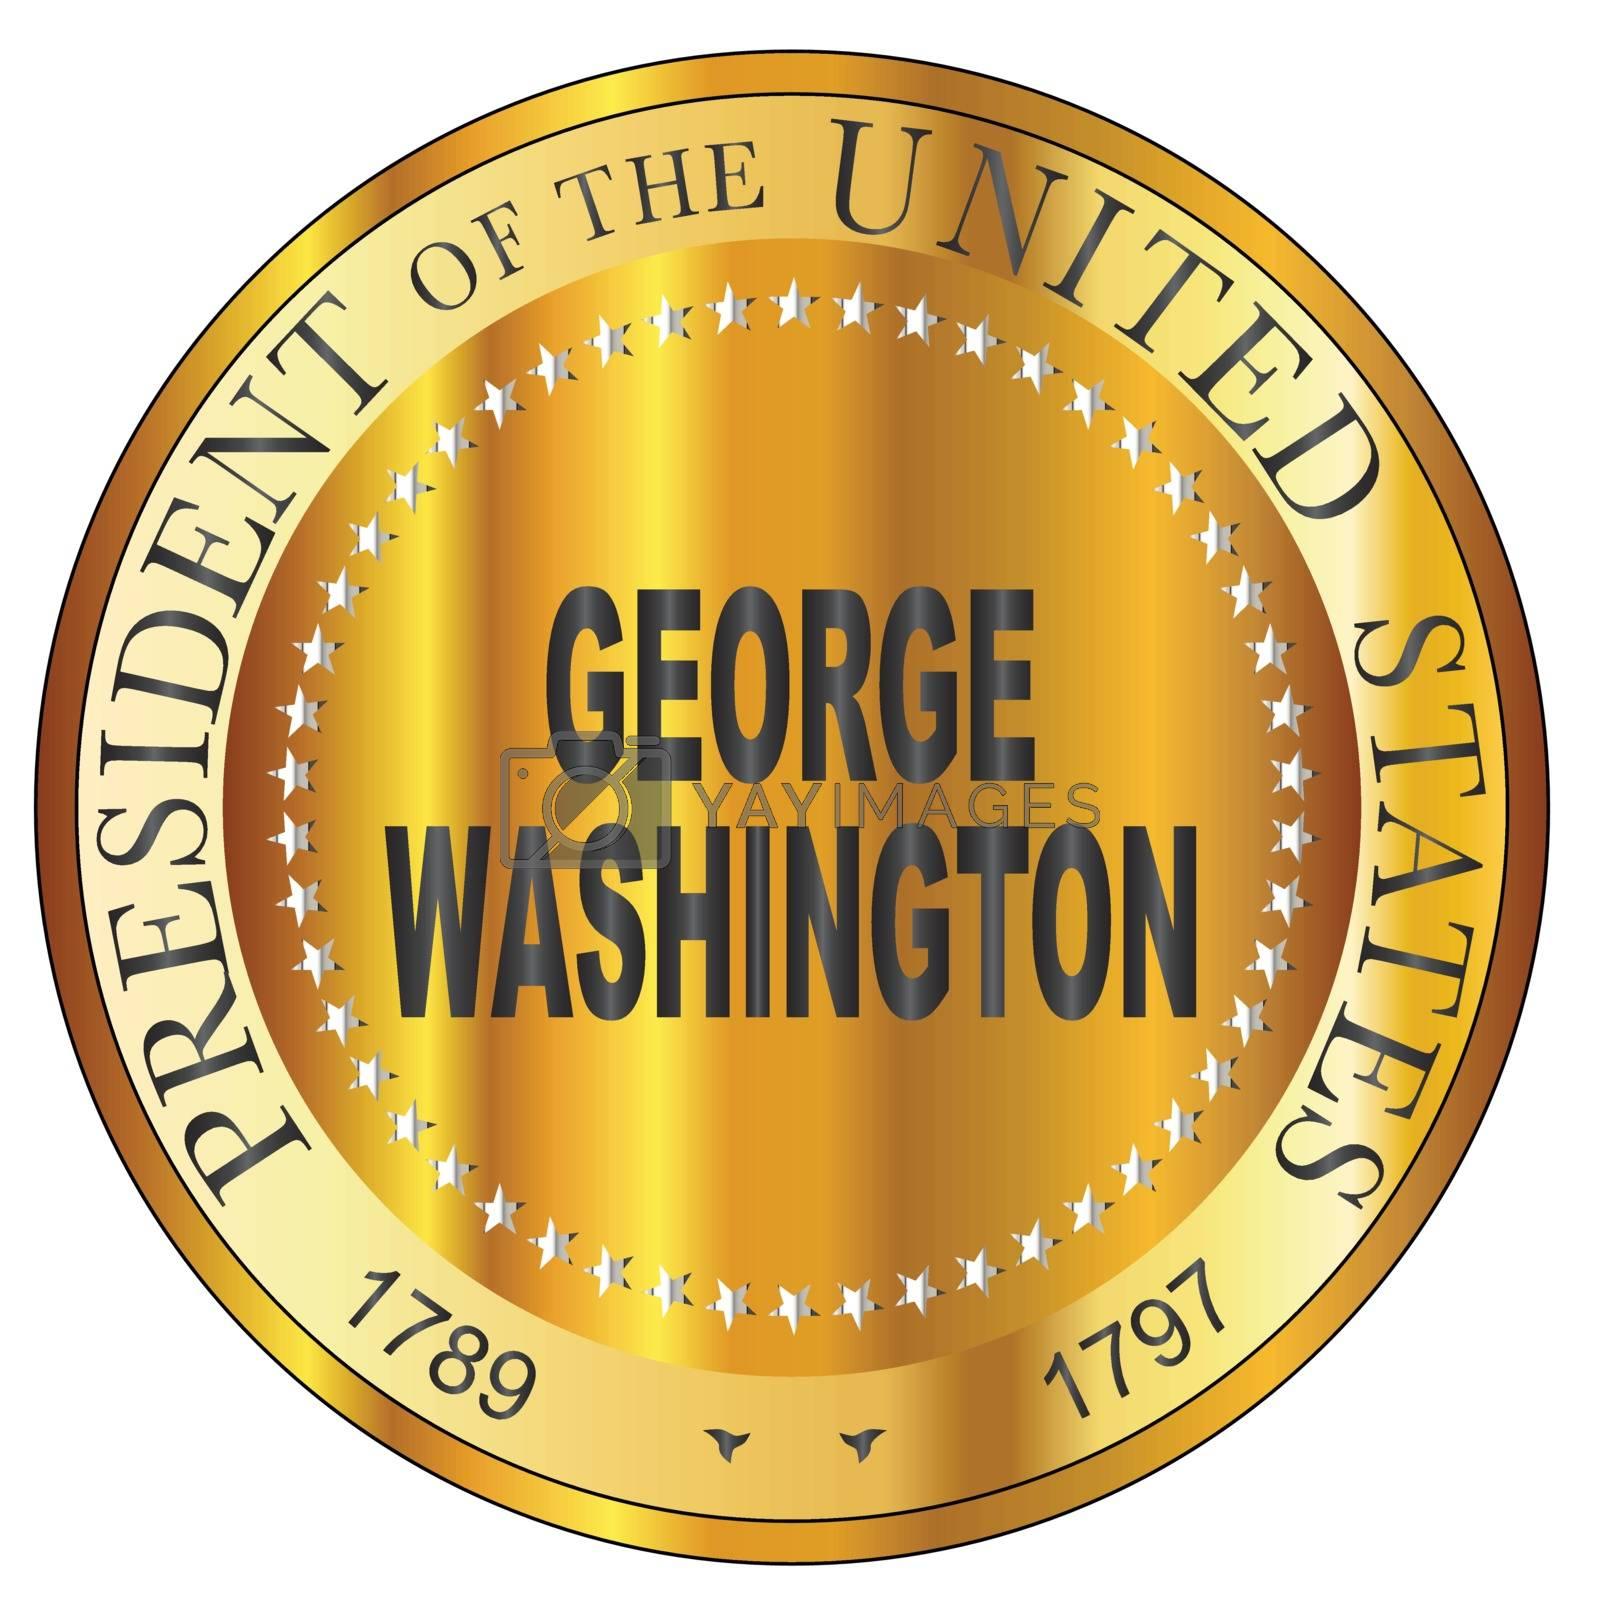 George Washington president of the United States of America round stamp